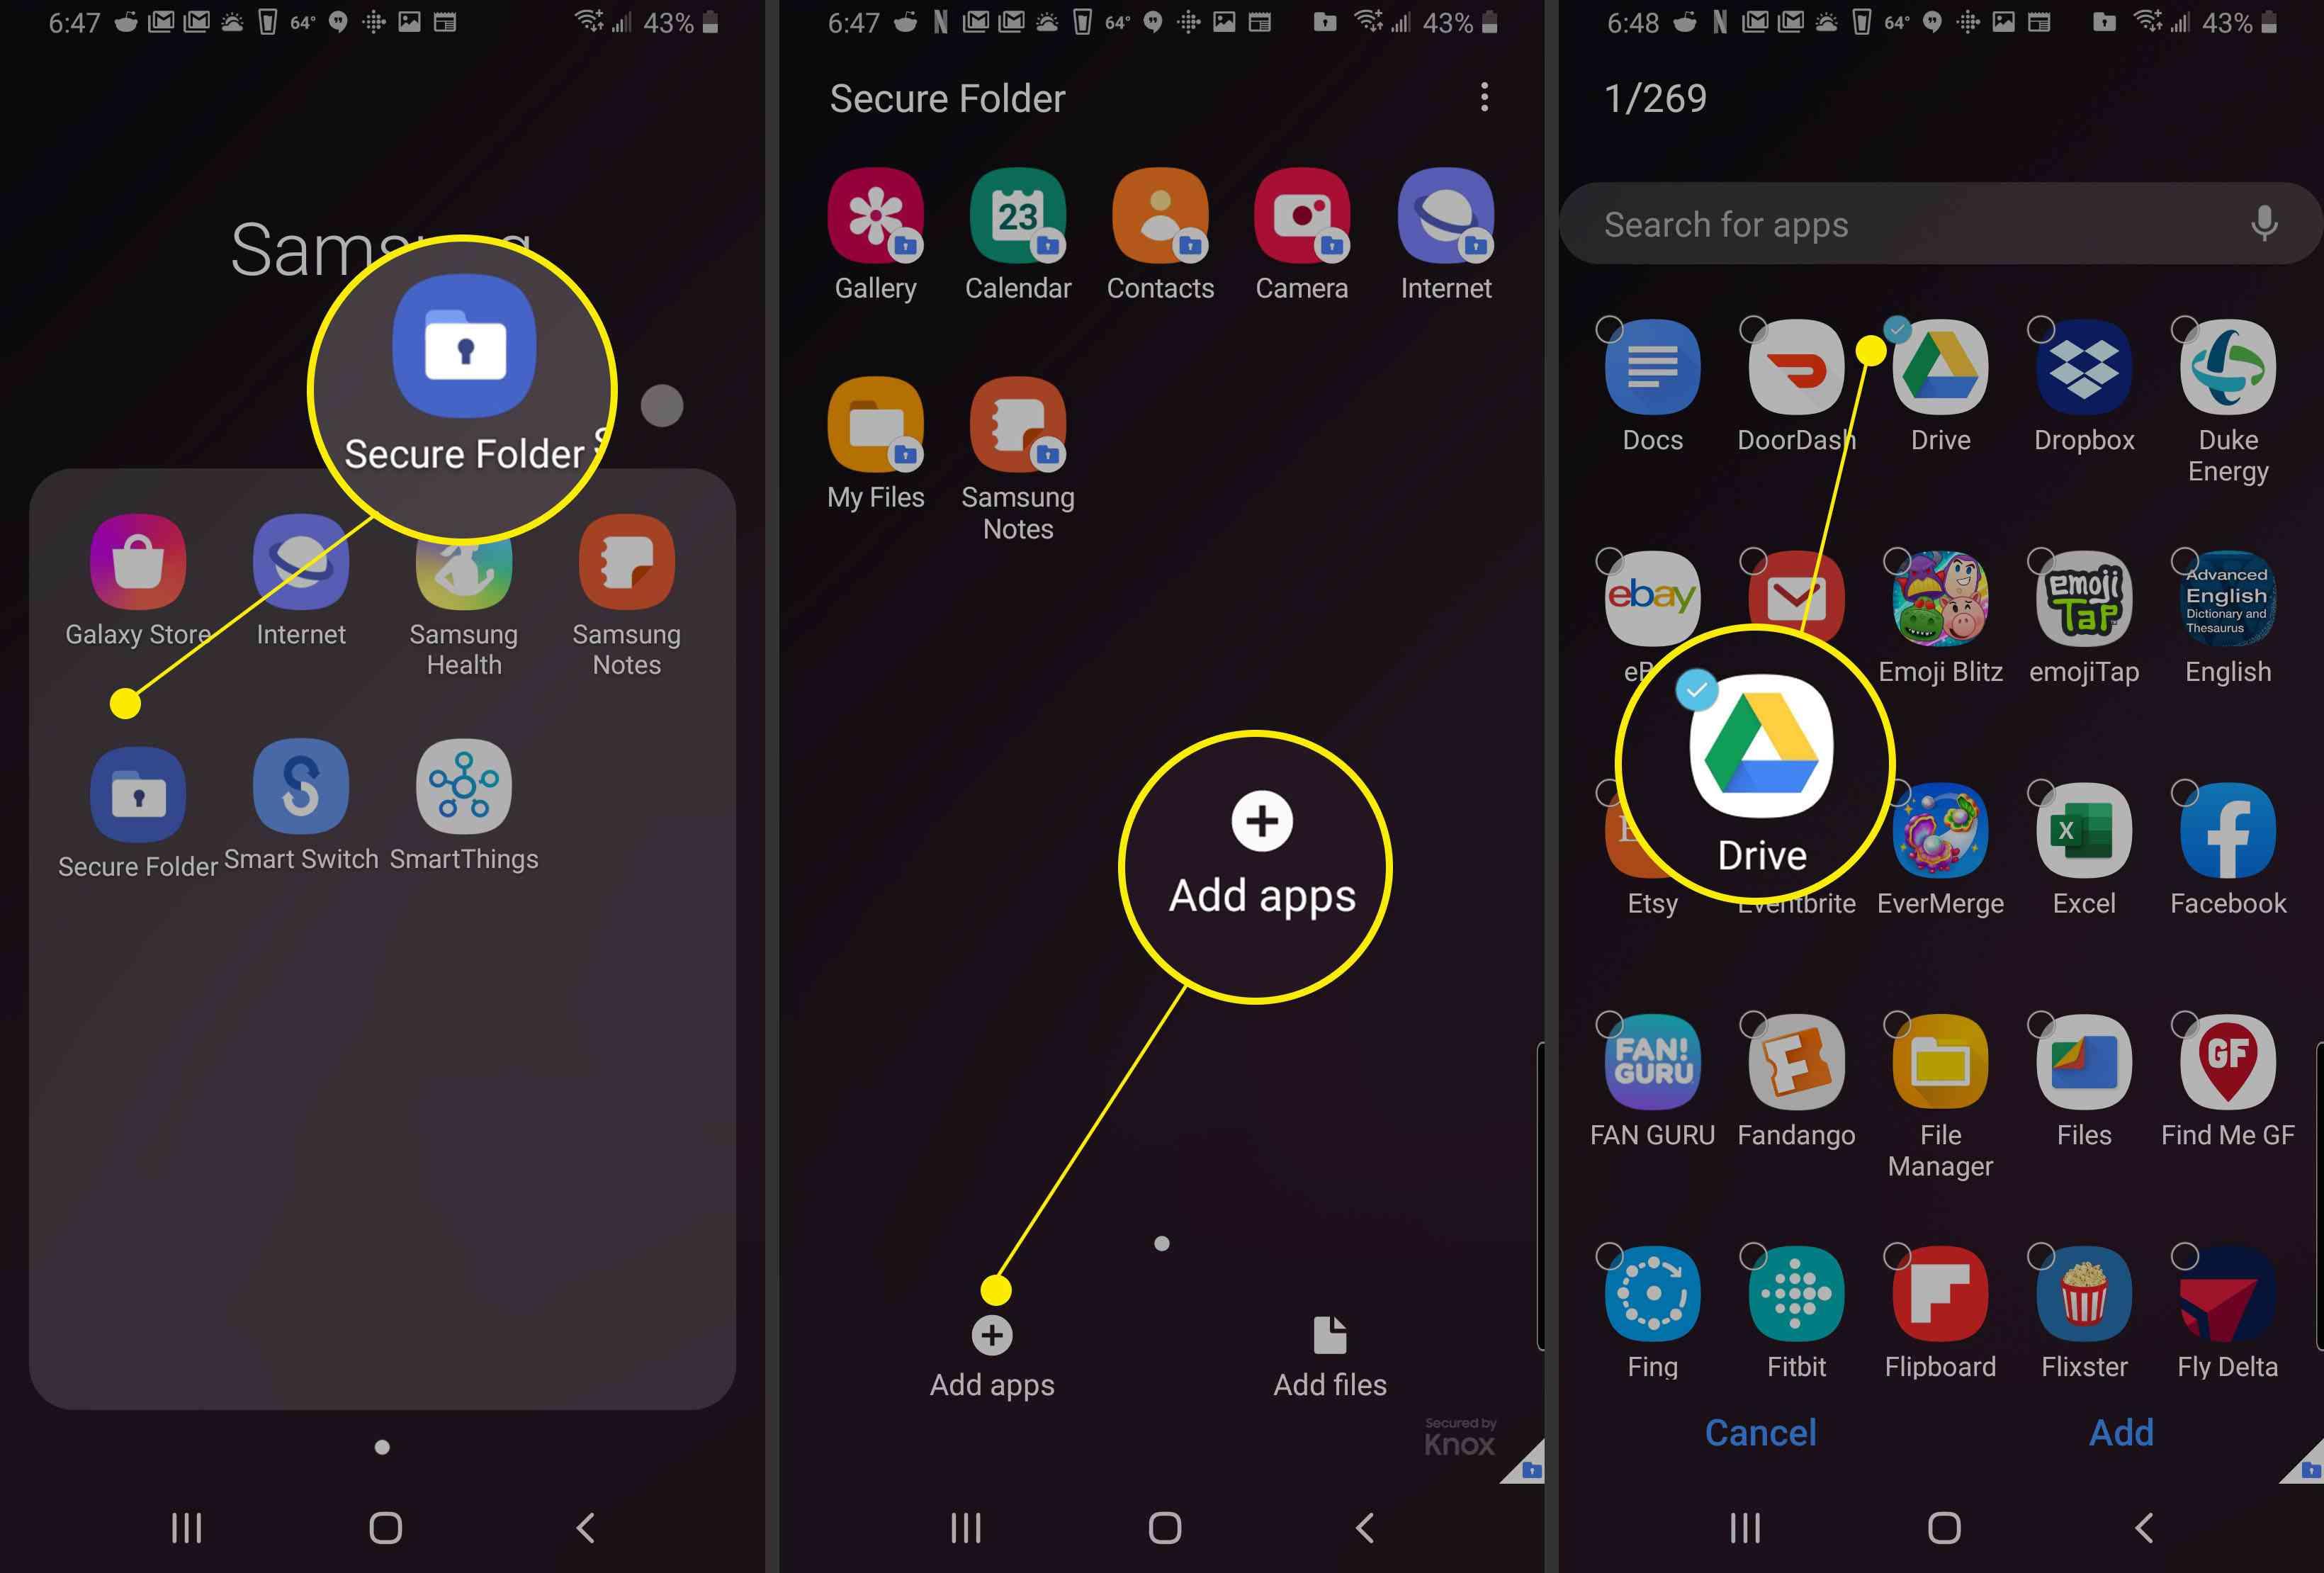 Adding an app to Samsung Secure Folder.